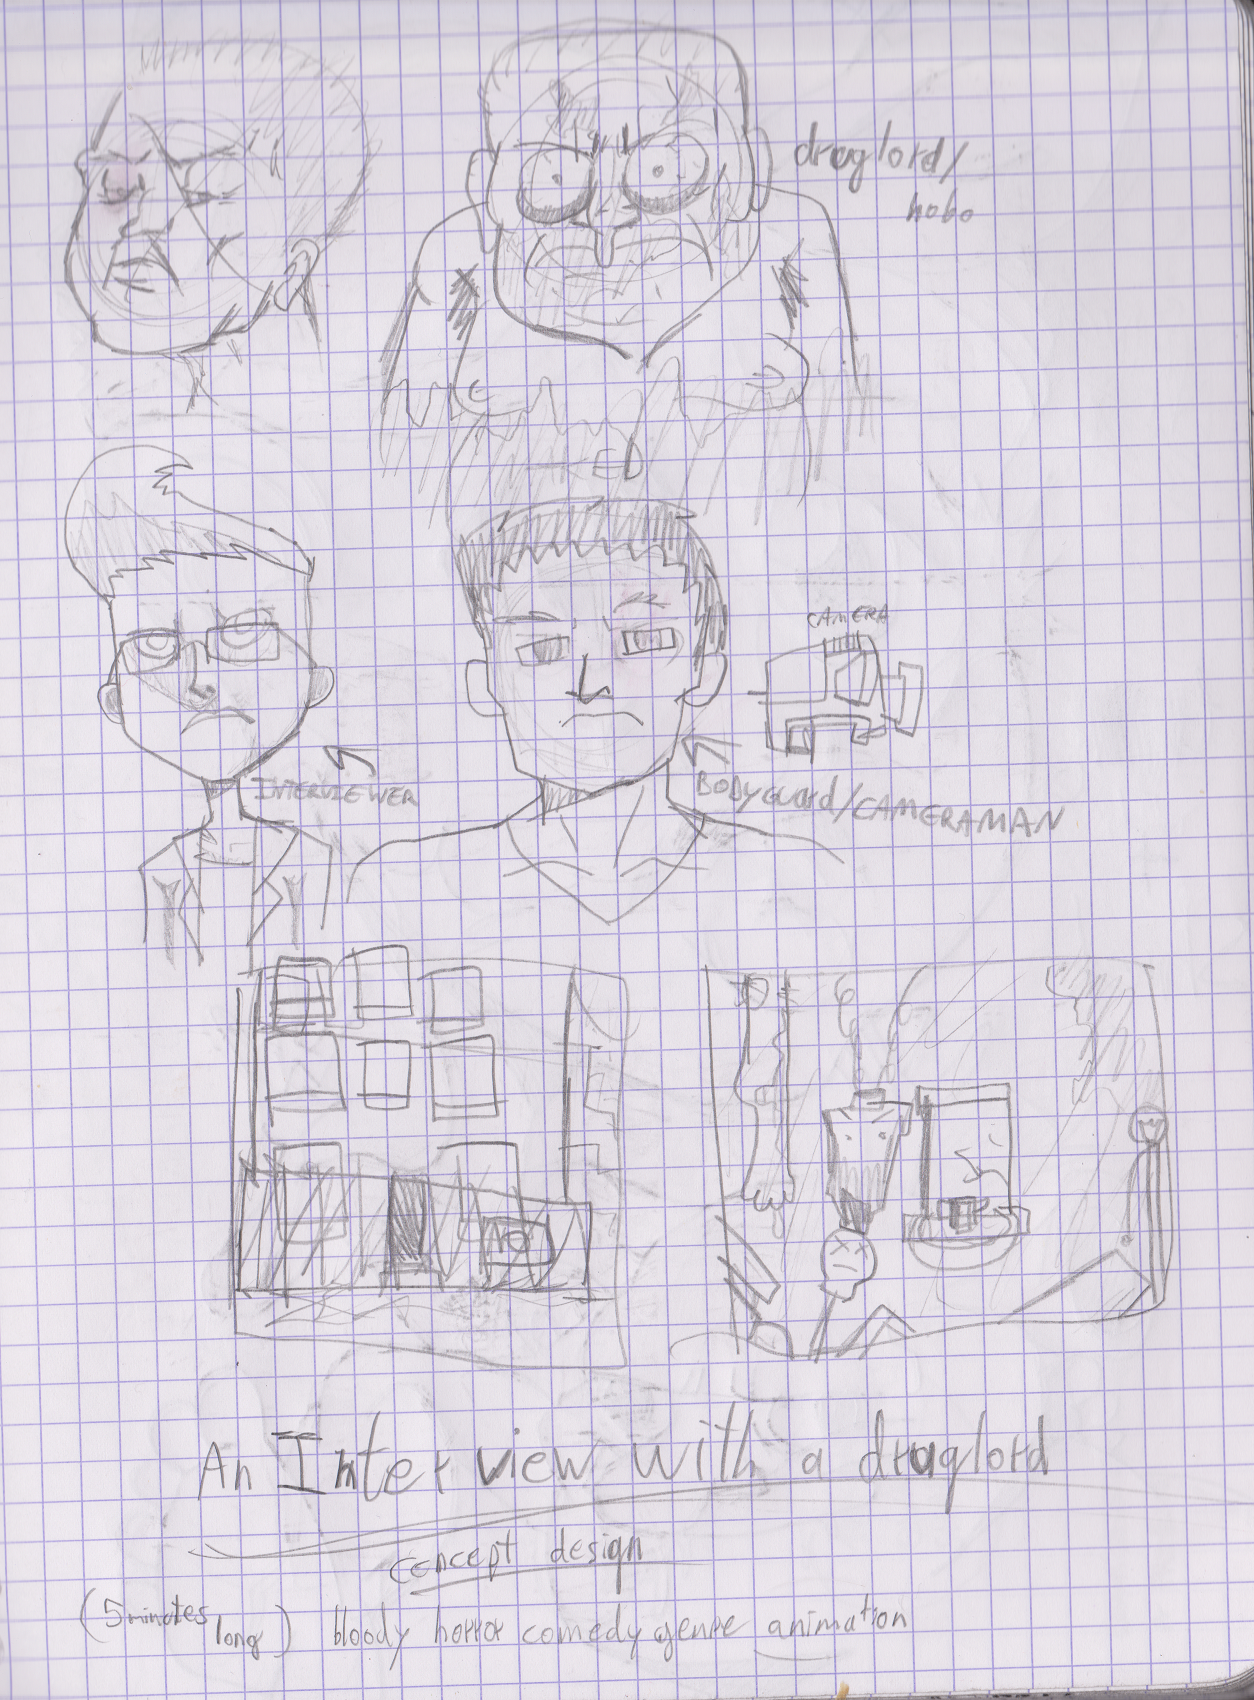 SH sketchbook page 42